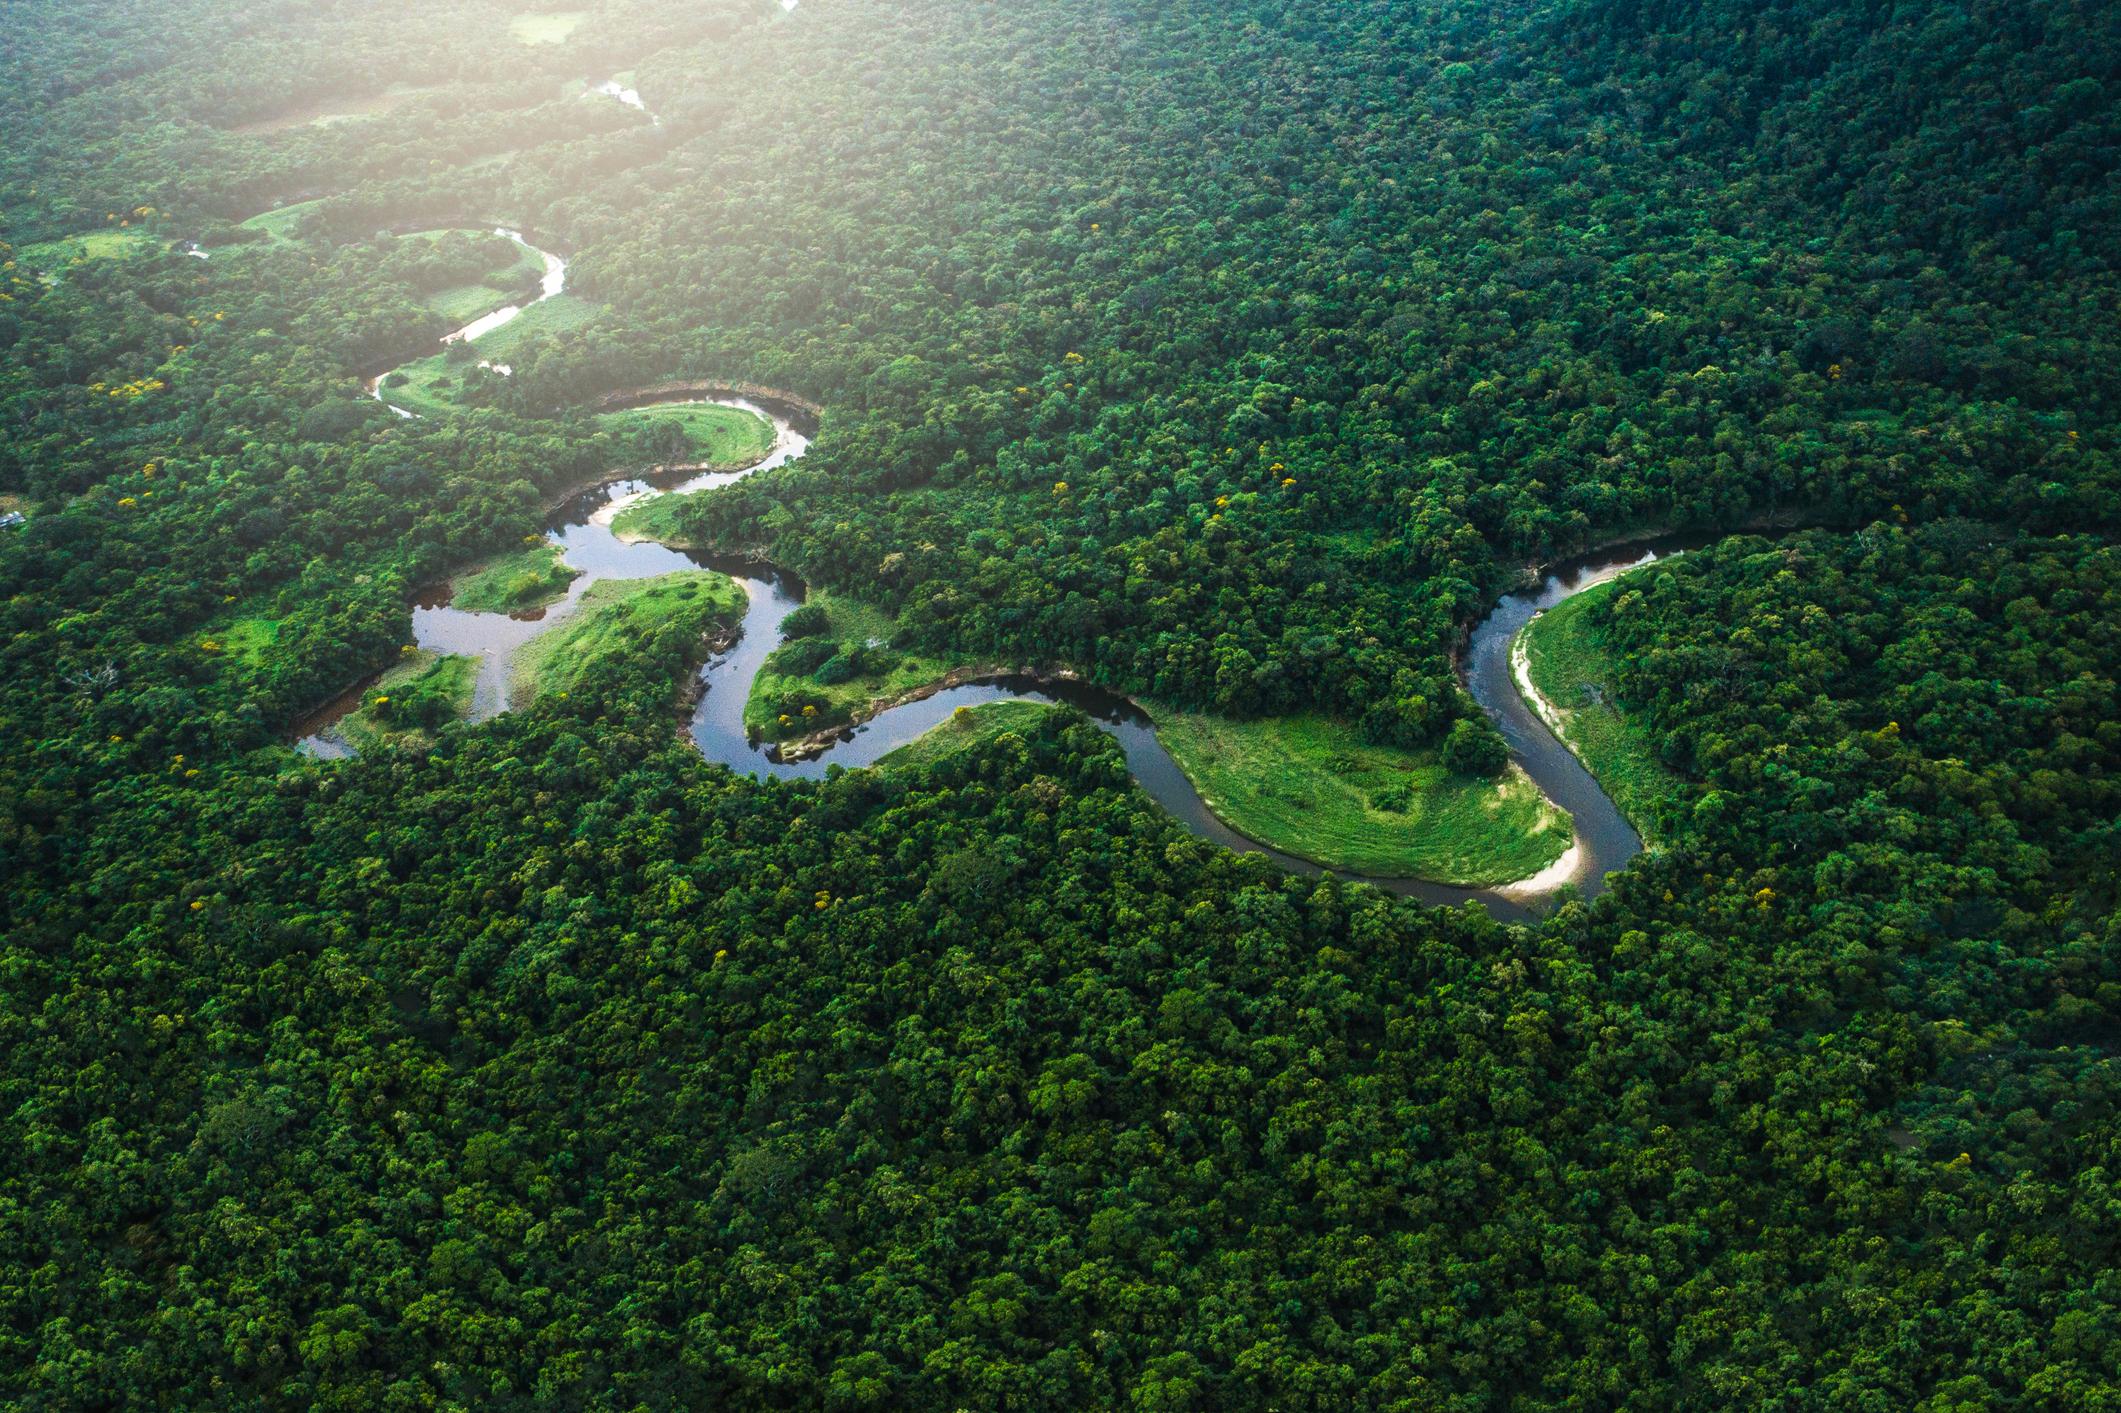 The Mata Atlântica rainforest